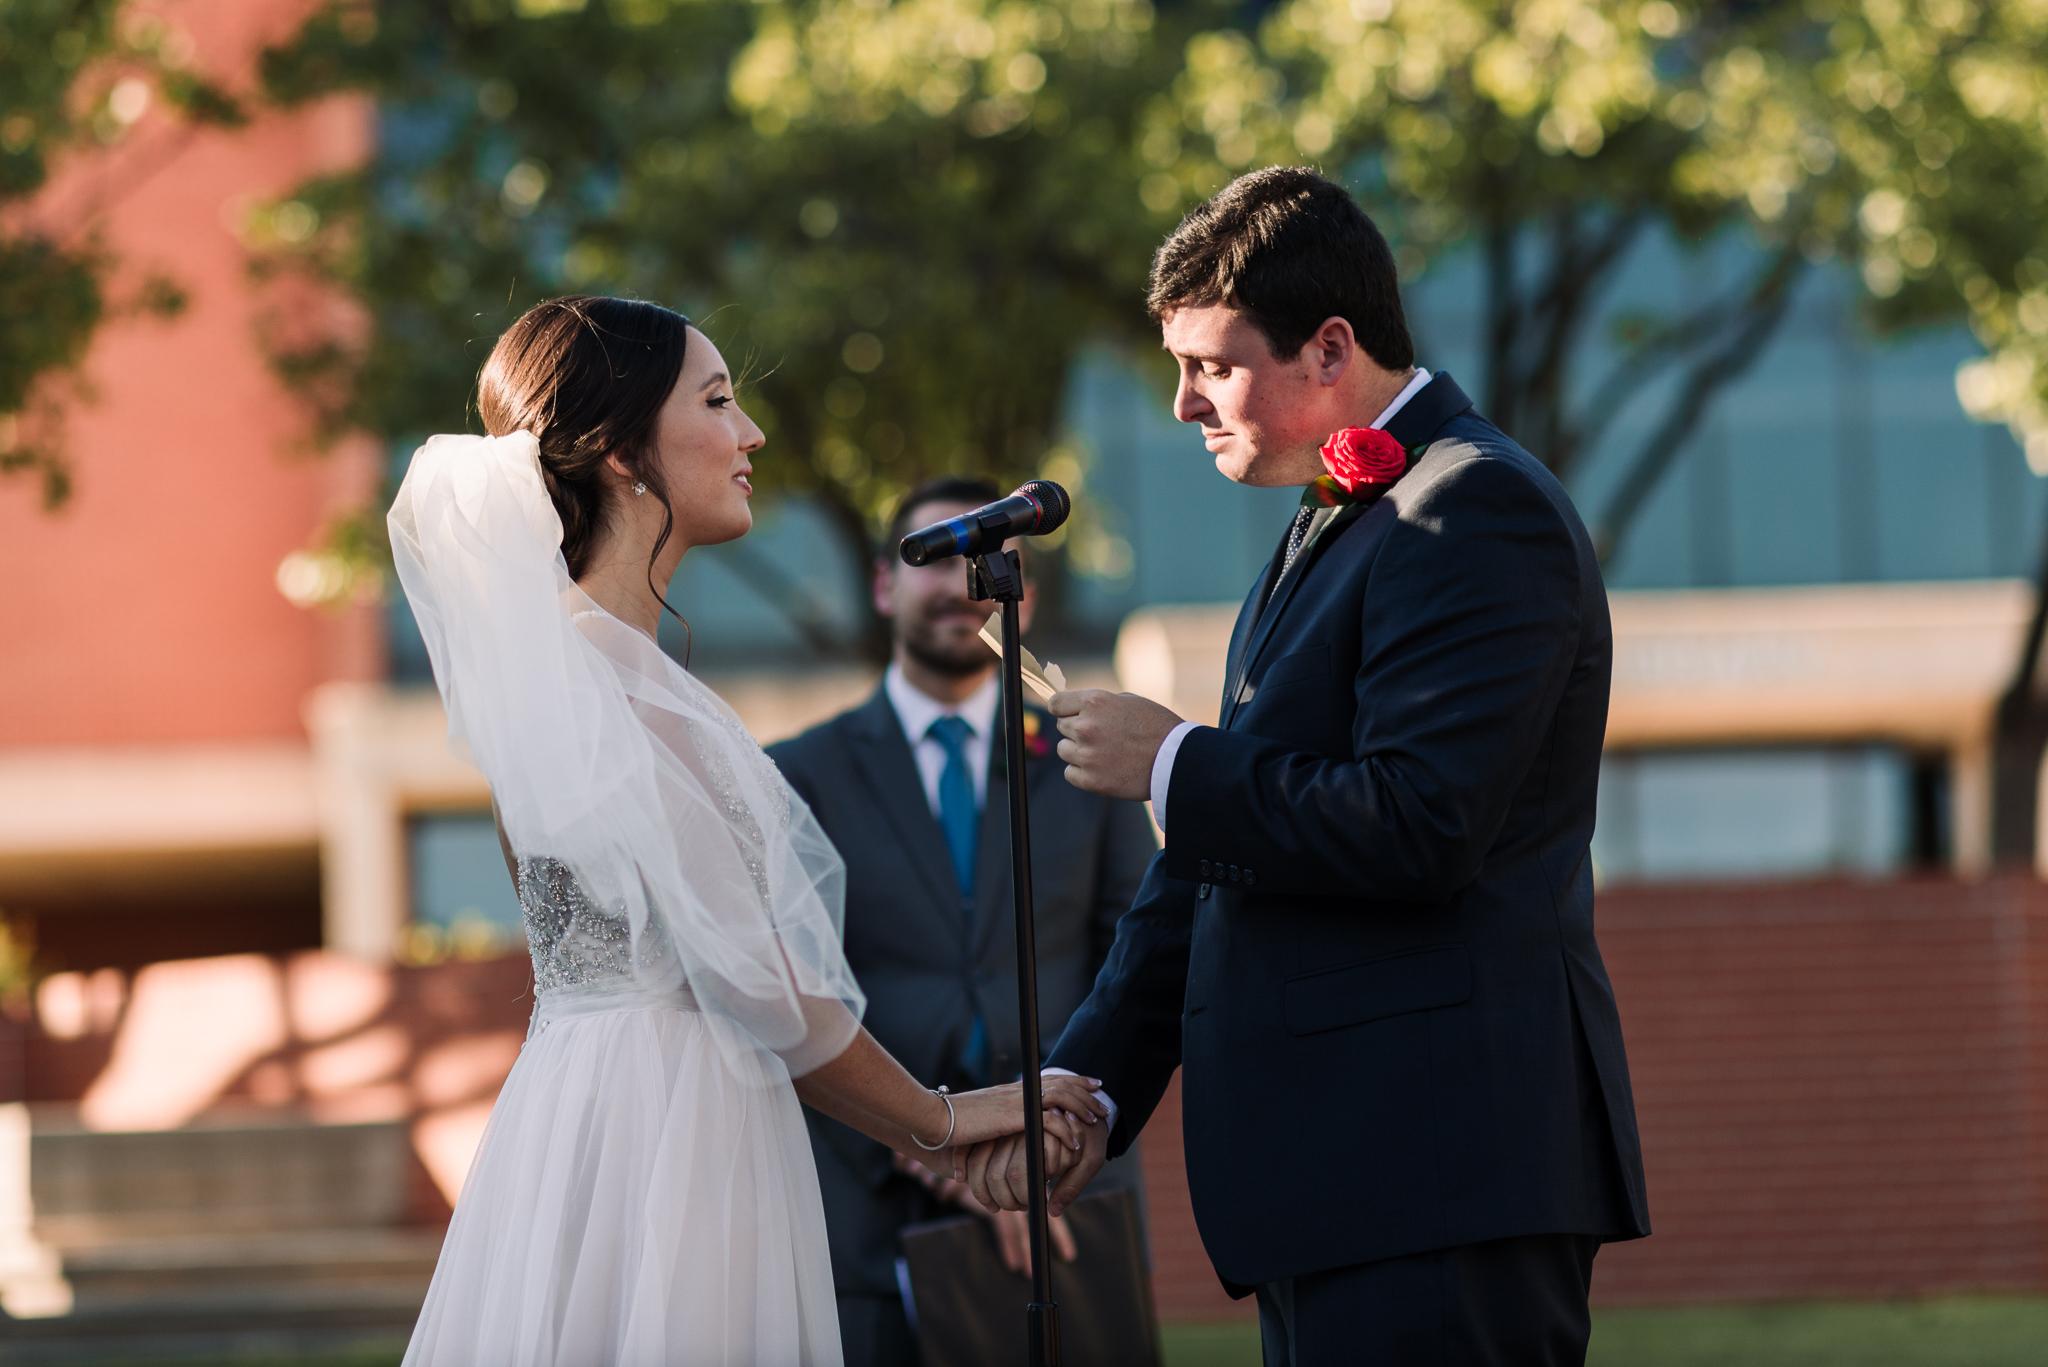 Oklahoma-Christian-University-Wedding-0416.jpg